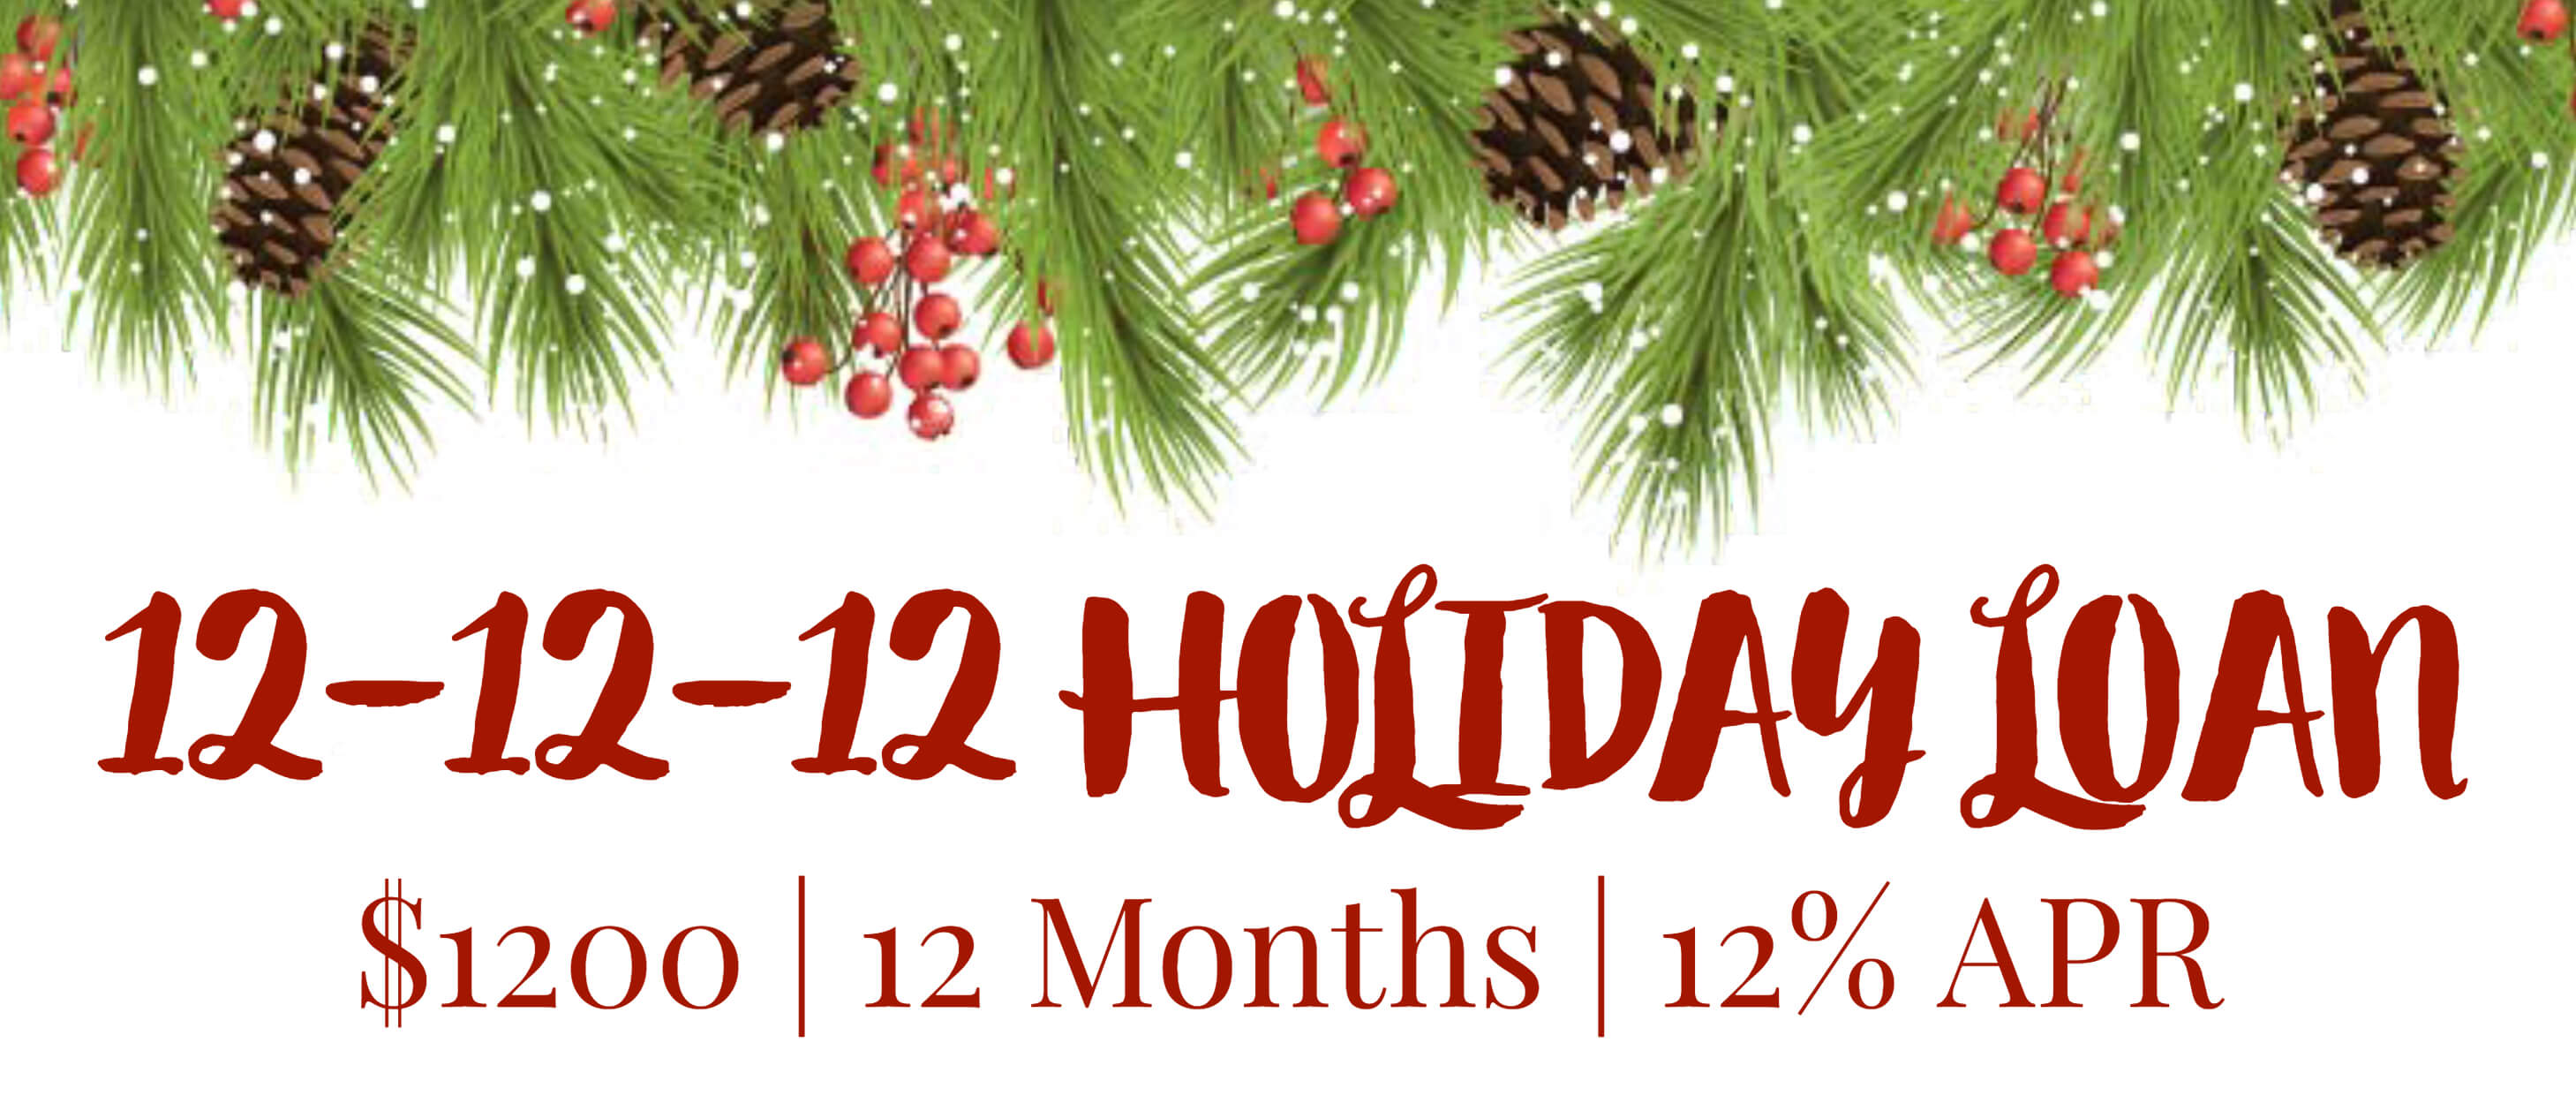 12-12-12 Holiday Loan